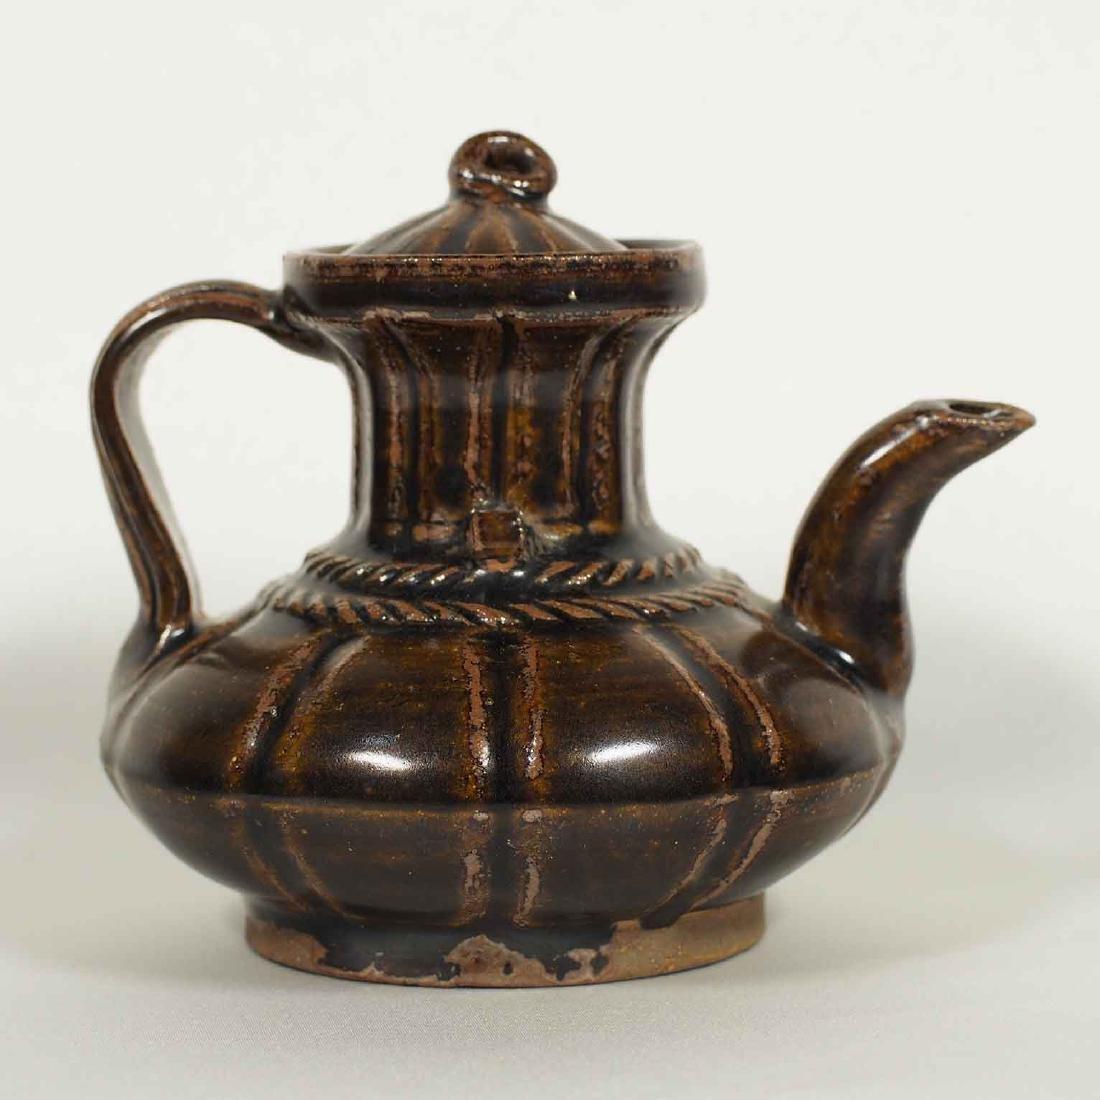 Black glazed Arabic Style Ewer with Lid, Song Dynasty - 2